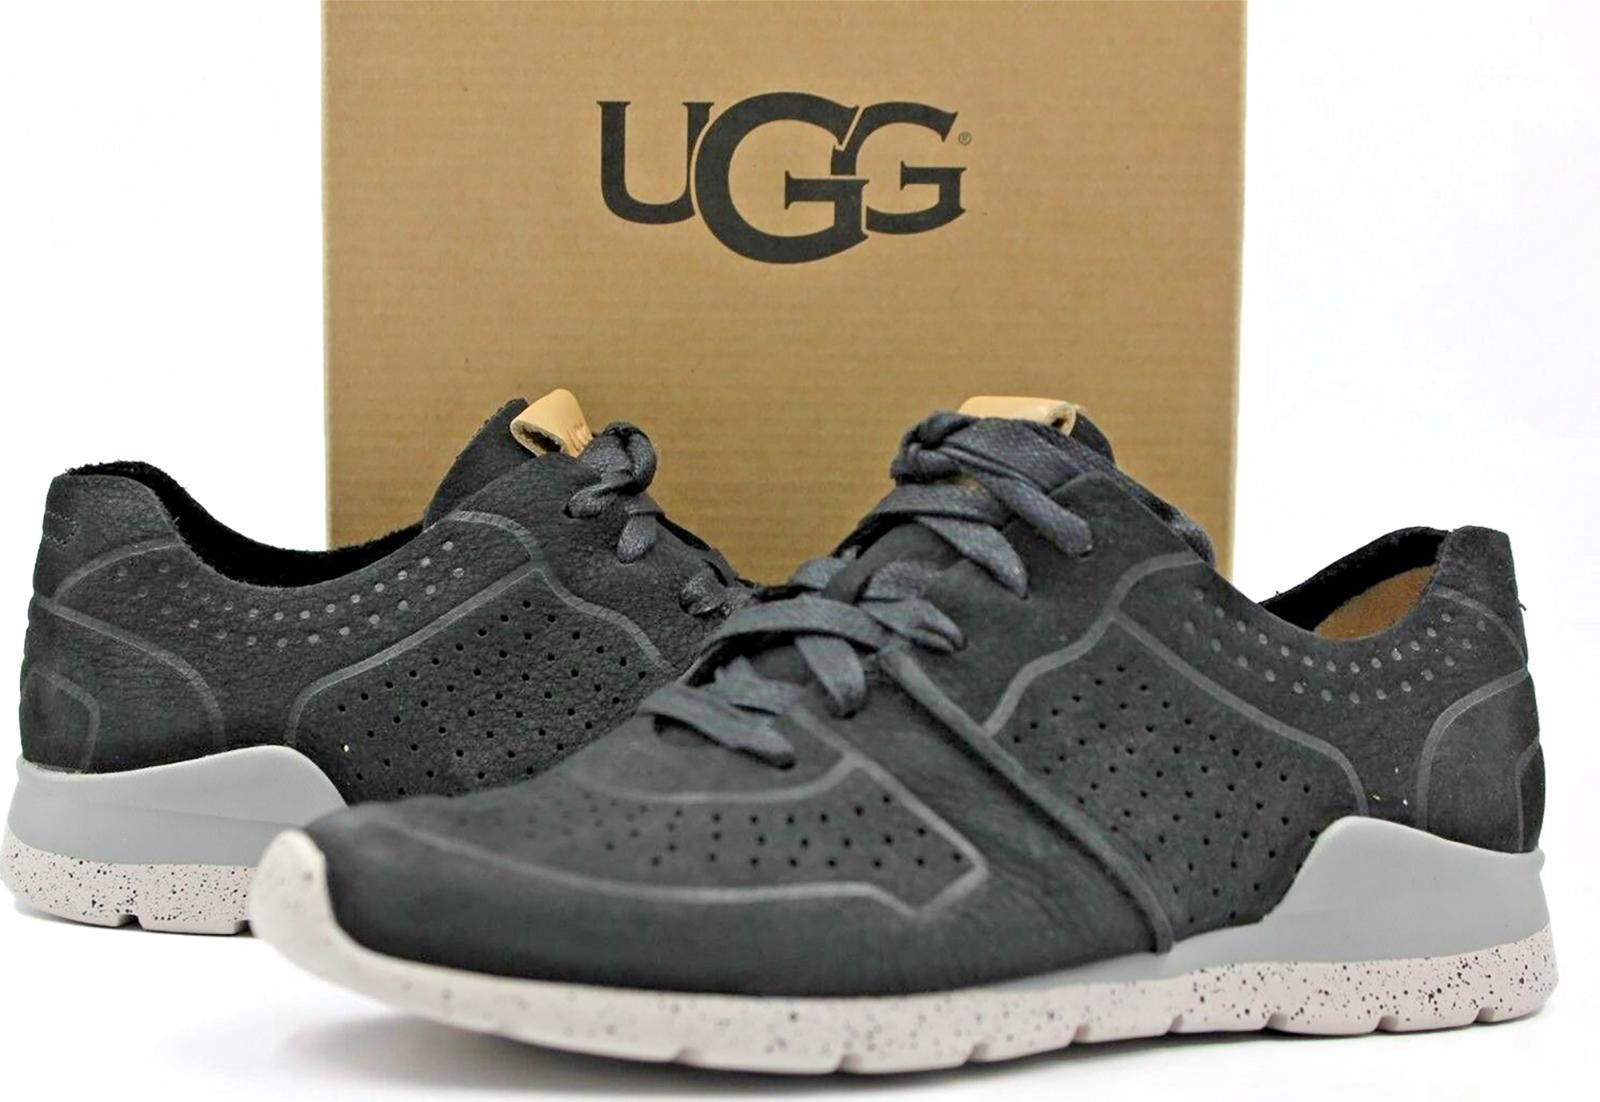 Ugg  Australia Tye Sneakers Tennis Black Women's Casual Shoes Size 6